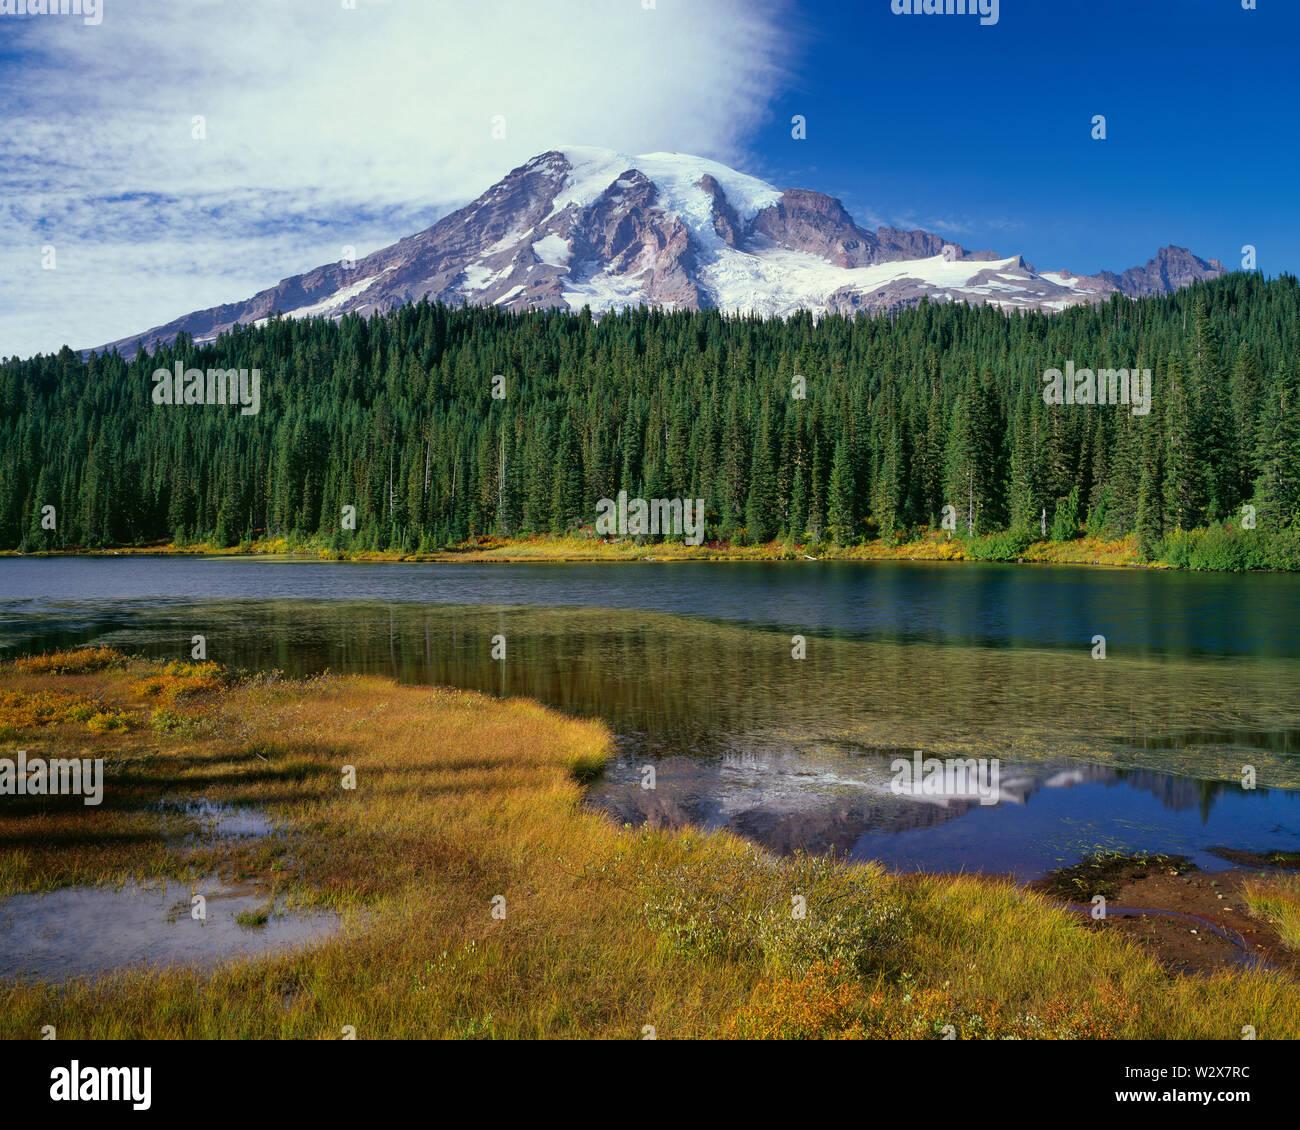 USA, Washington, Mt. Rainier National Park, Mt. Rainier and fall colored grass and shrubs along shore of Reflection Lake. - Stock Image